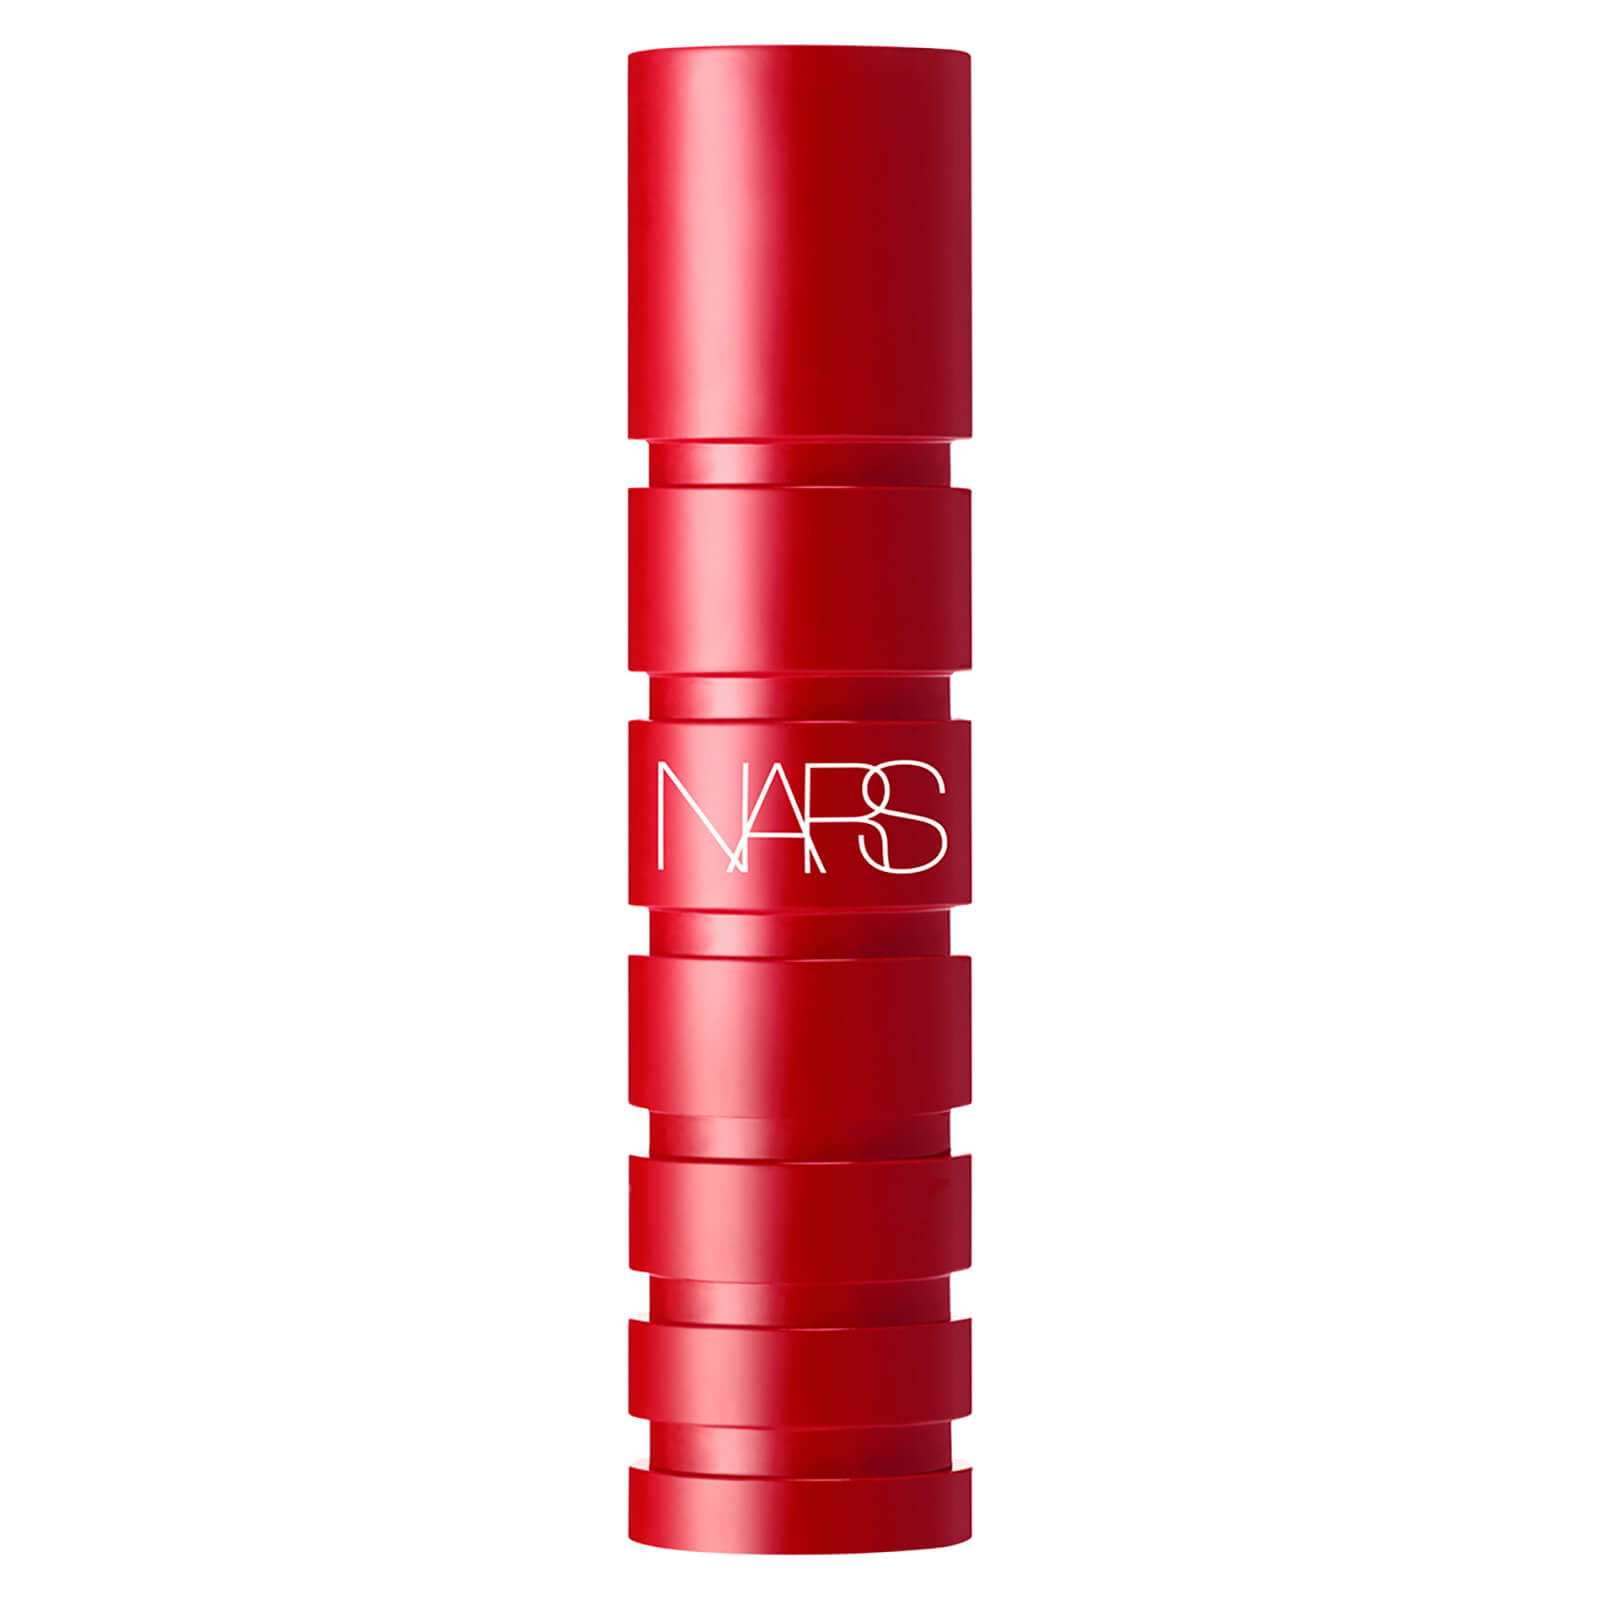 42d0b473a7c NARS Cosmetics Climax Mini Mascara - Explicit Black 2.5g | Free Shipping |  Lookfantastic